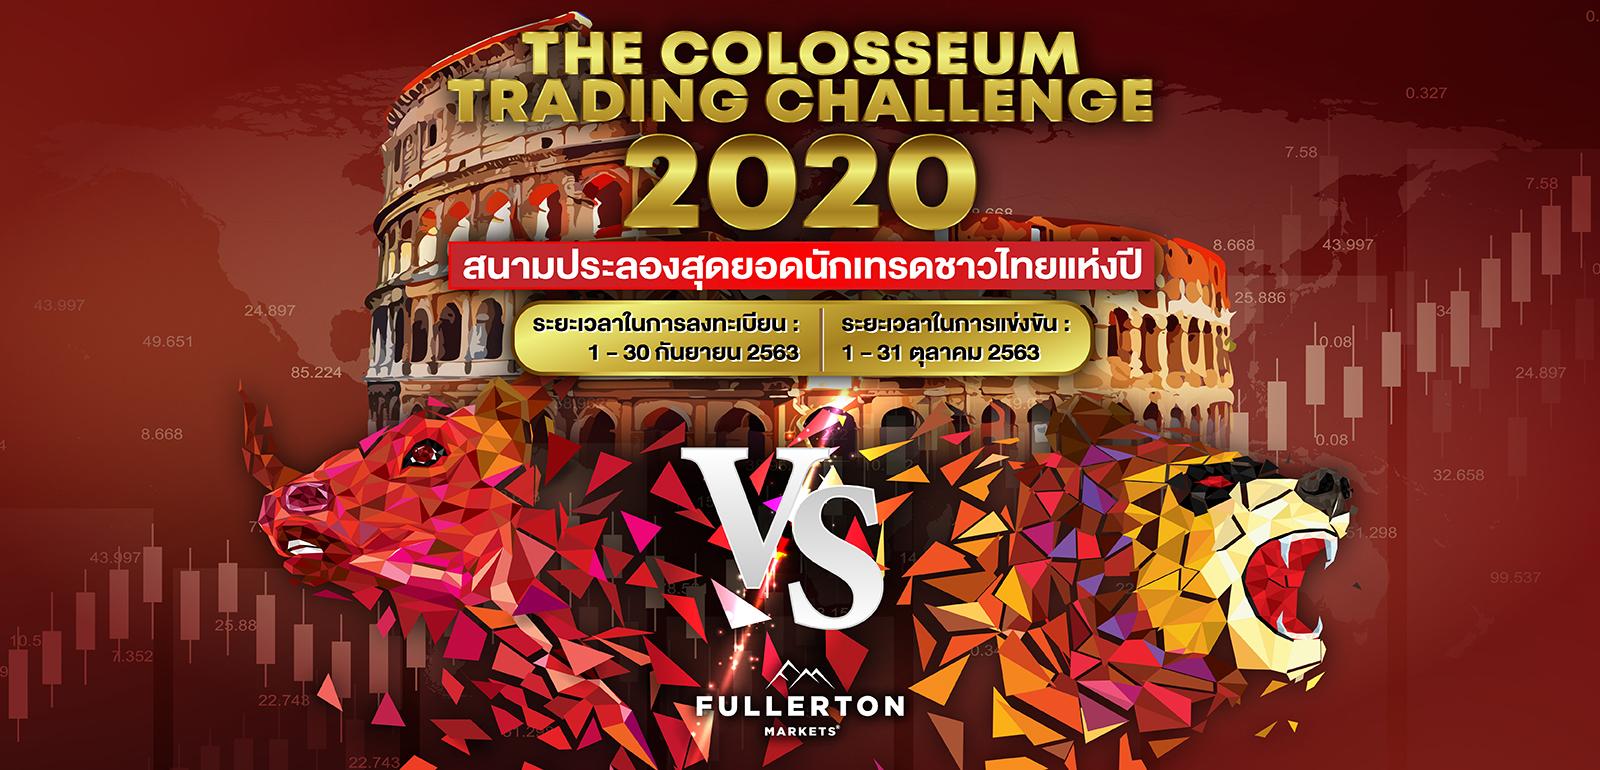 Colosseum Trading Challenge 2020